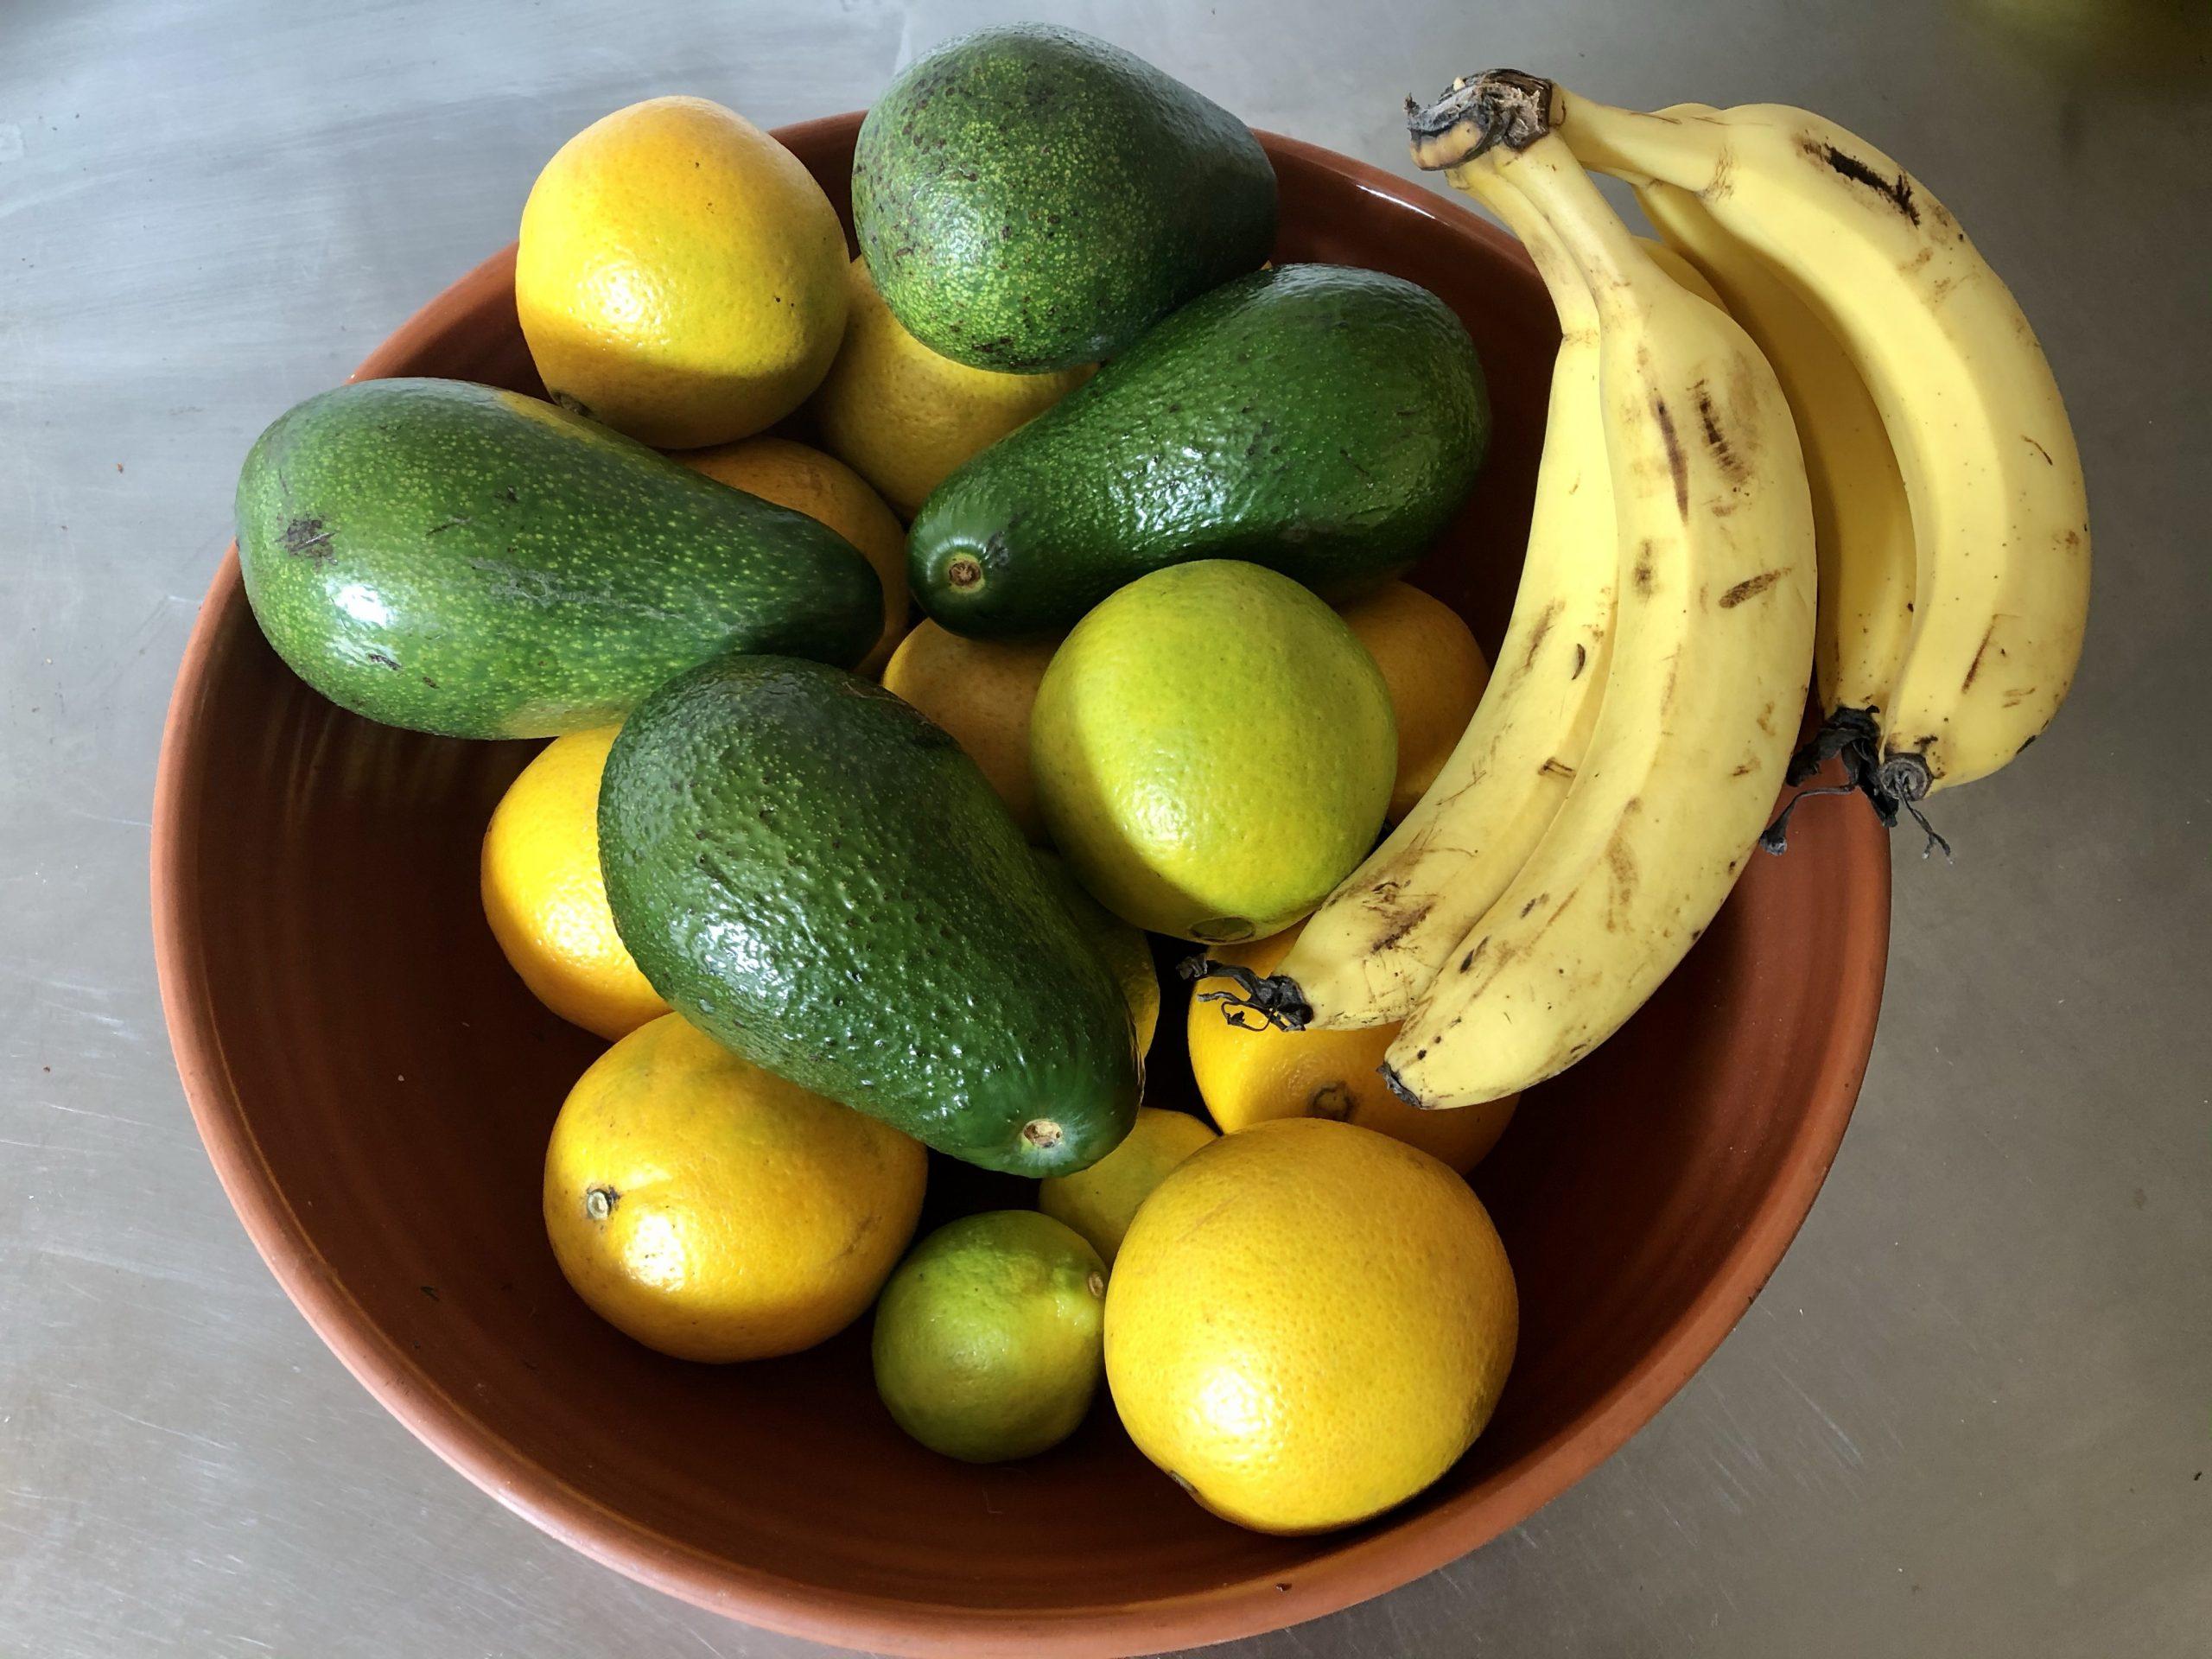 Autumn Still Life: Avocado, Bananas and Oranges